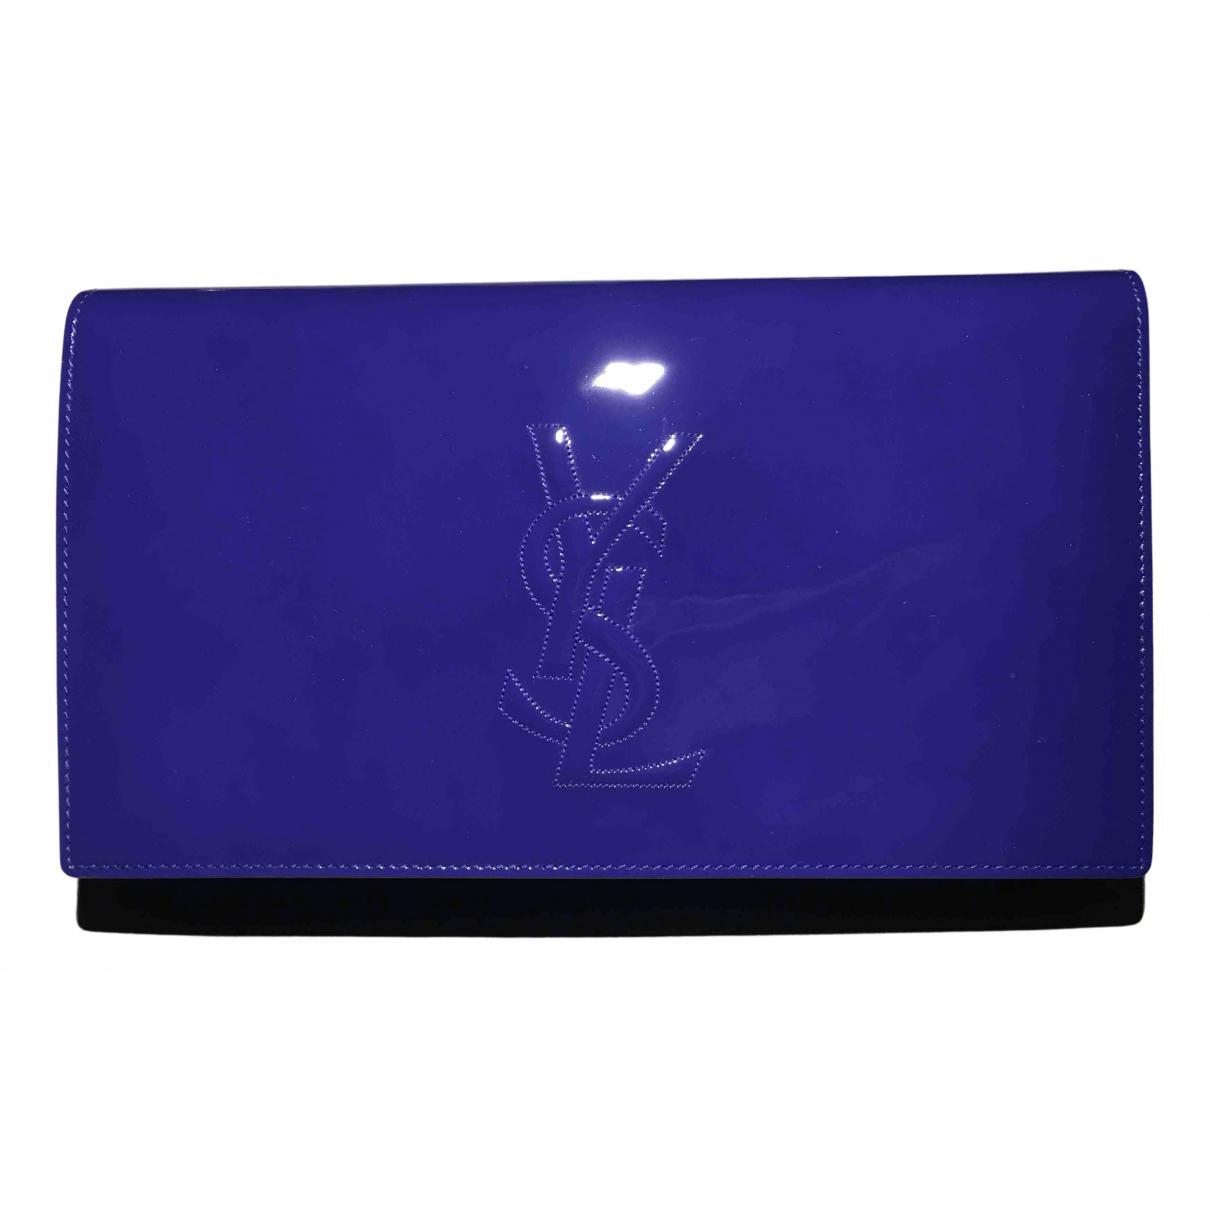 Pochette Belle de Jour de Charol Yves Saint Laurent